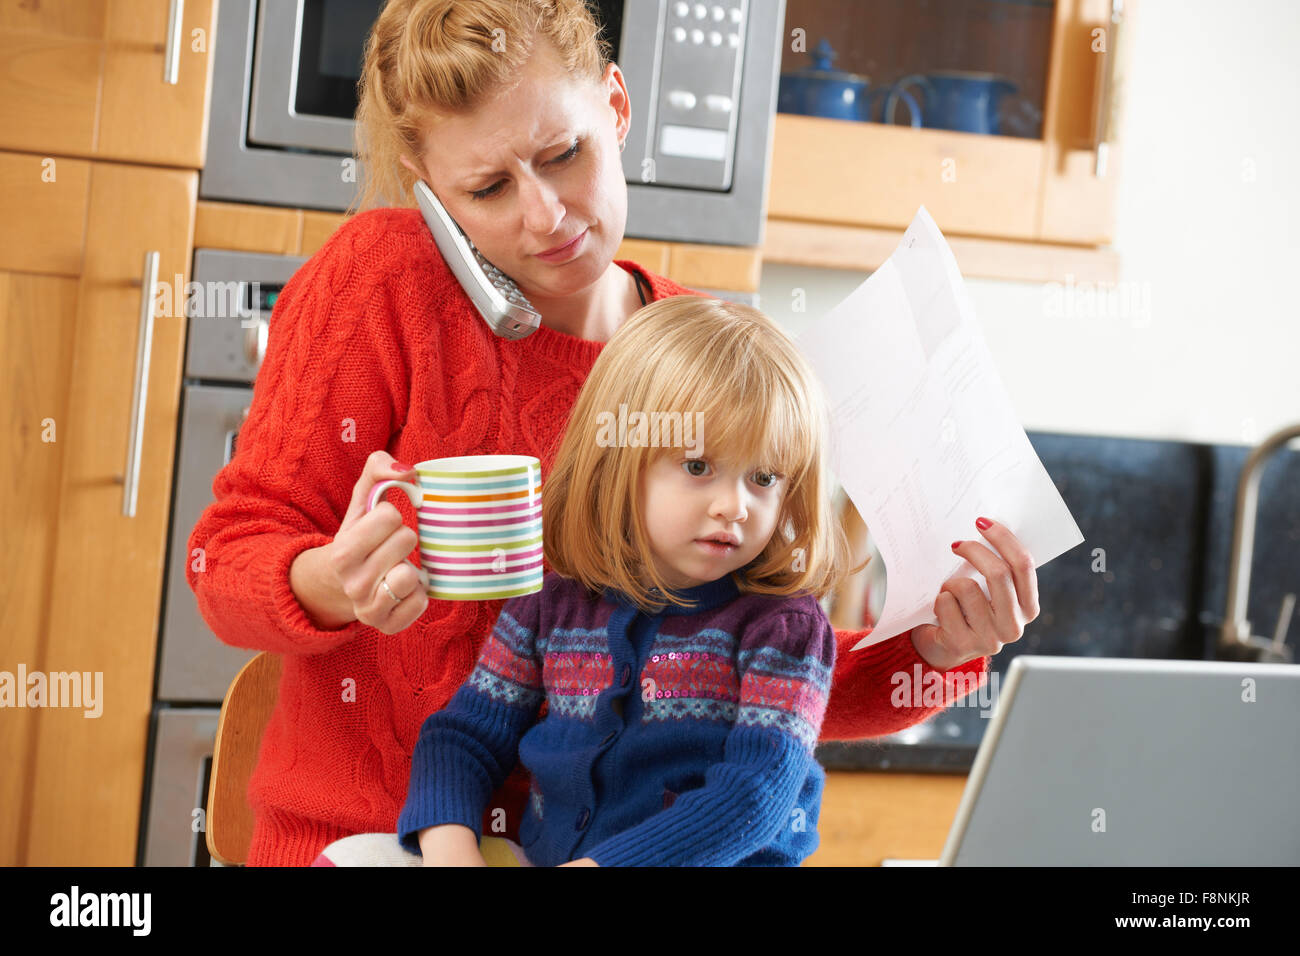 Ocupada Madre Sobrellevar estresante día en casa Imagen De Stock